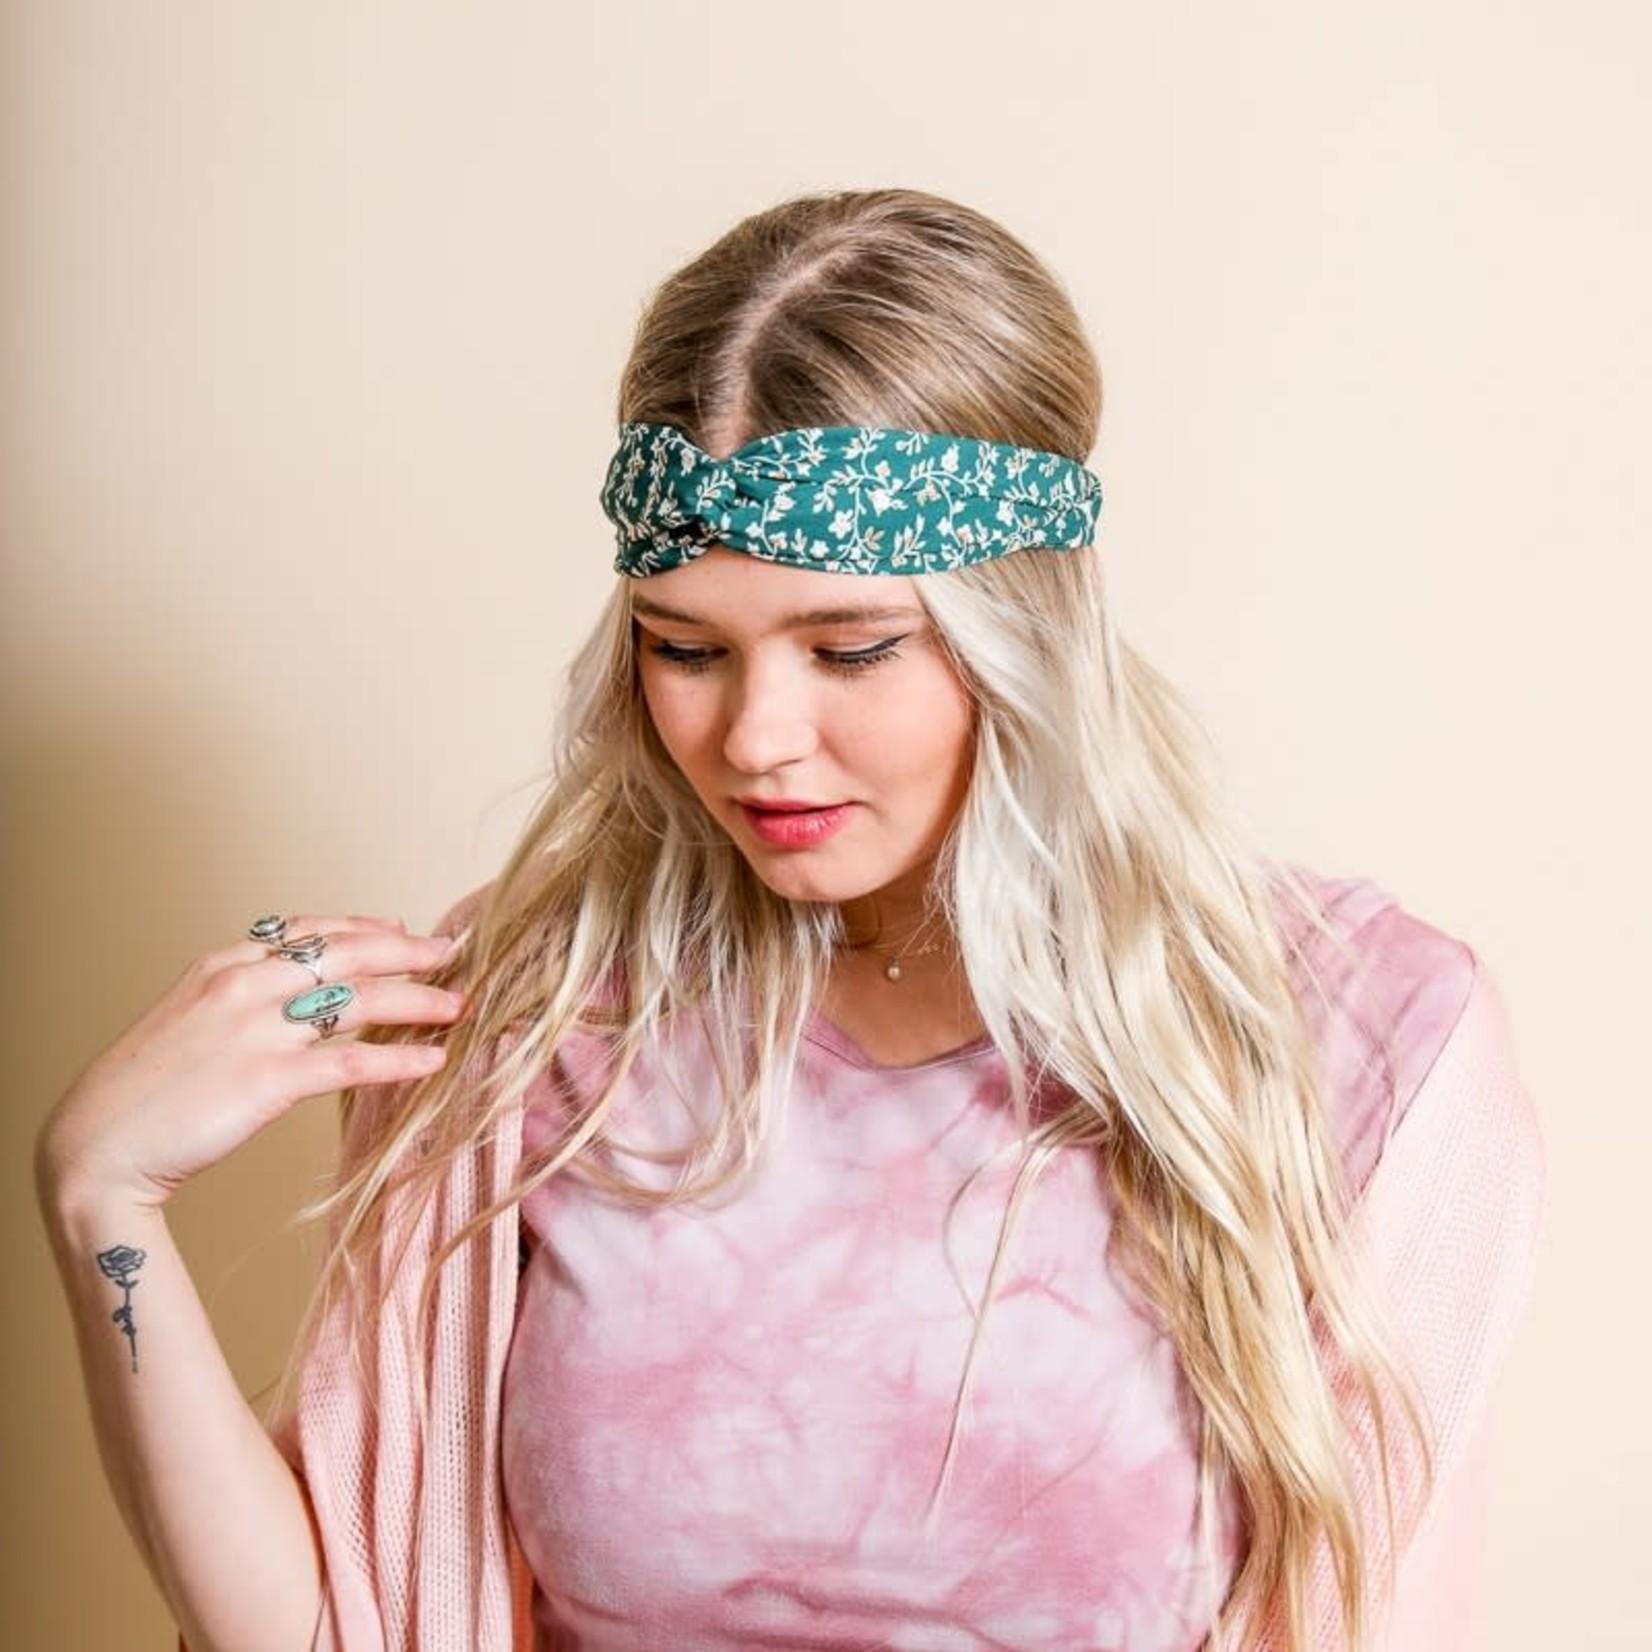 leto Floral Trailing Vine Twist Headwrap 1614